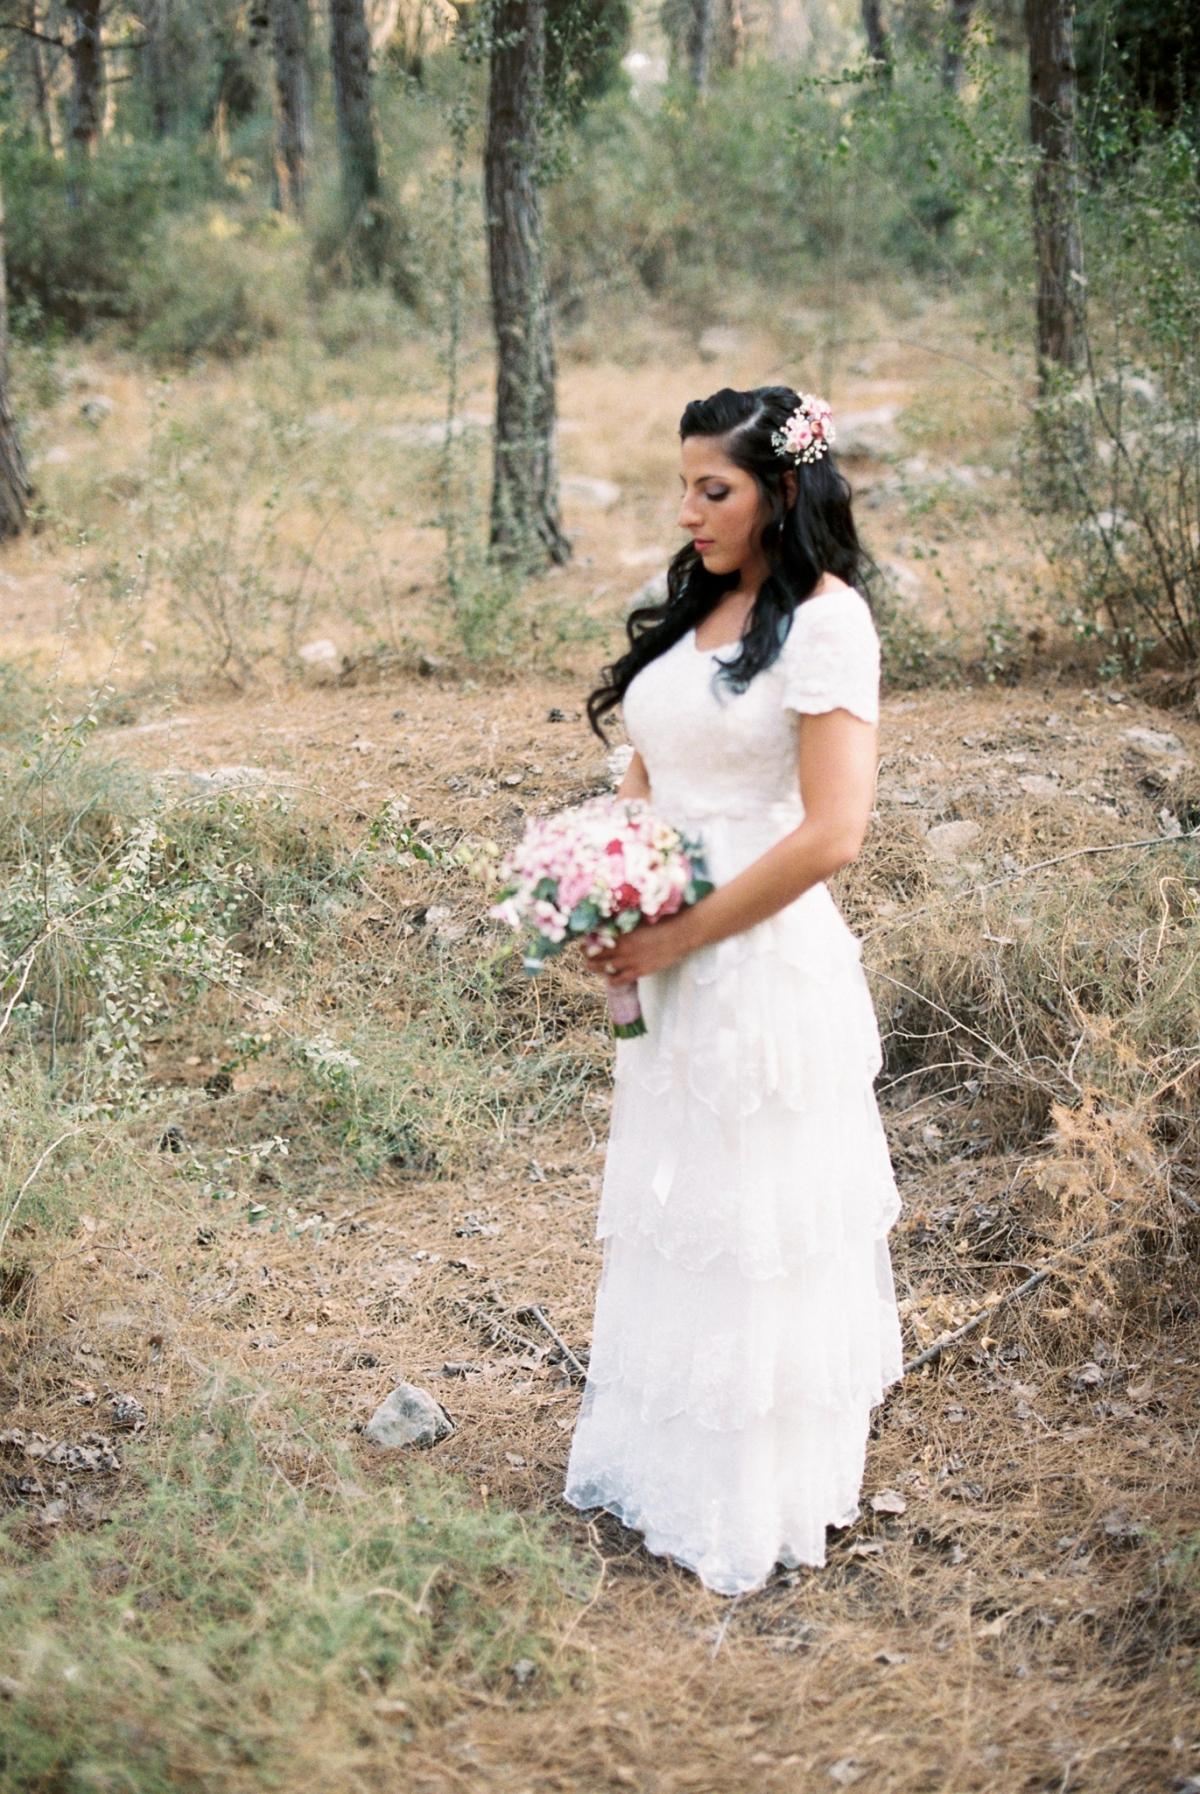 neot-kedumim-wedding-israel-shira-and-eilam-sigala-photography_0017